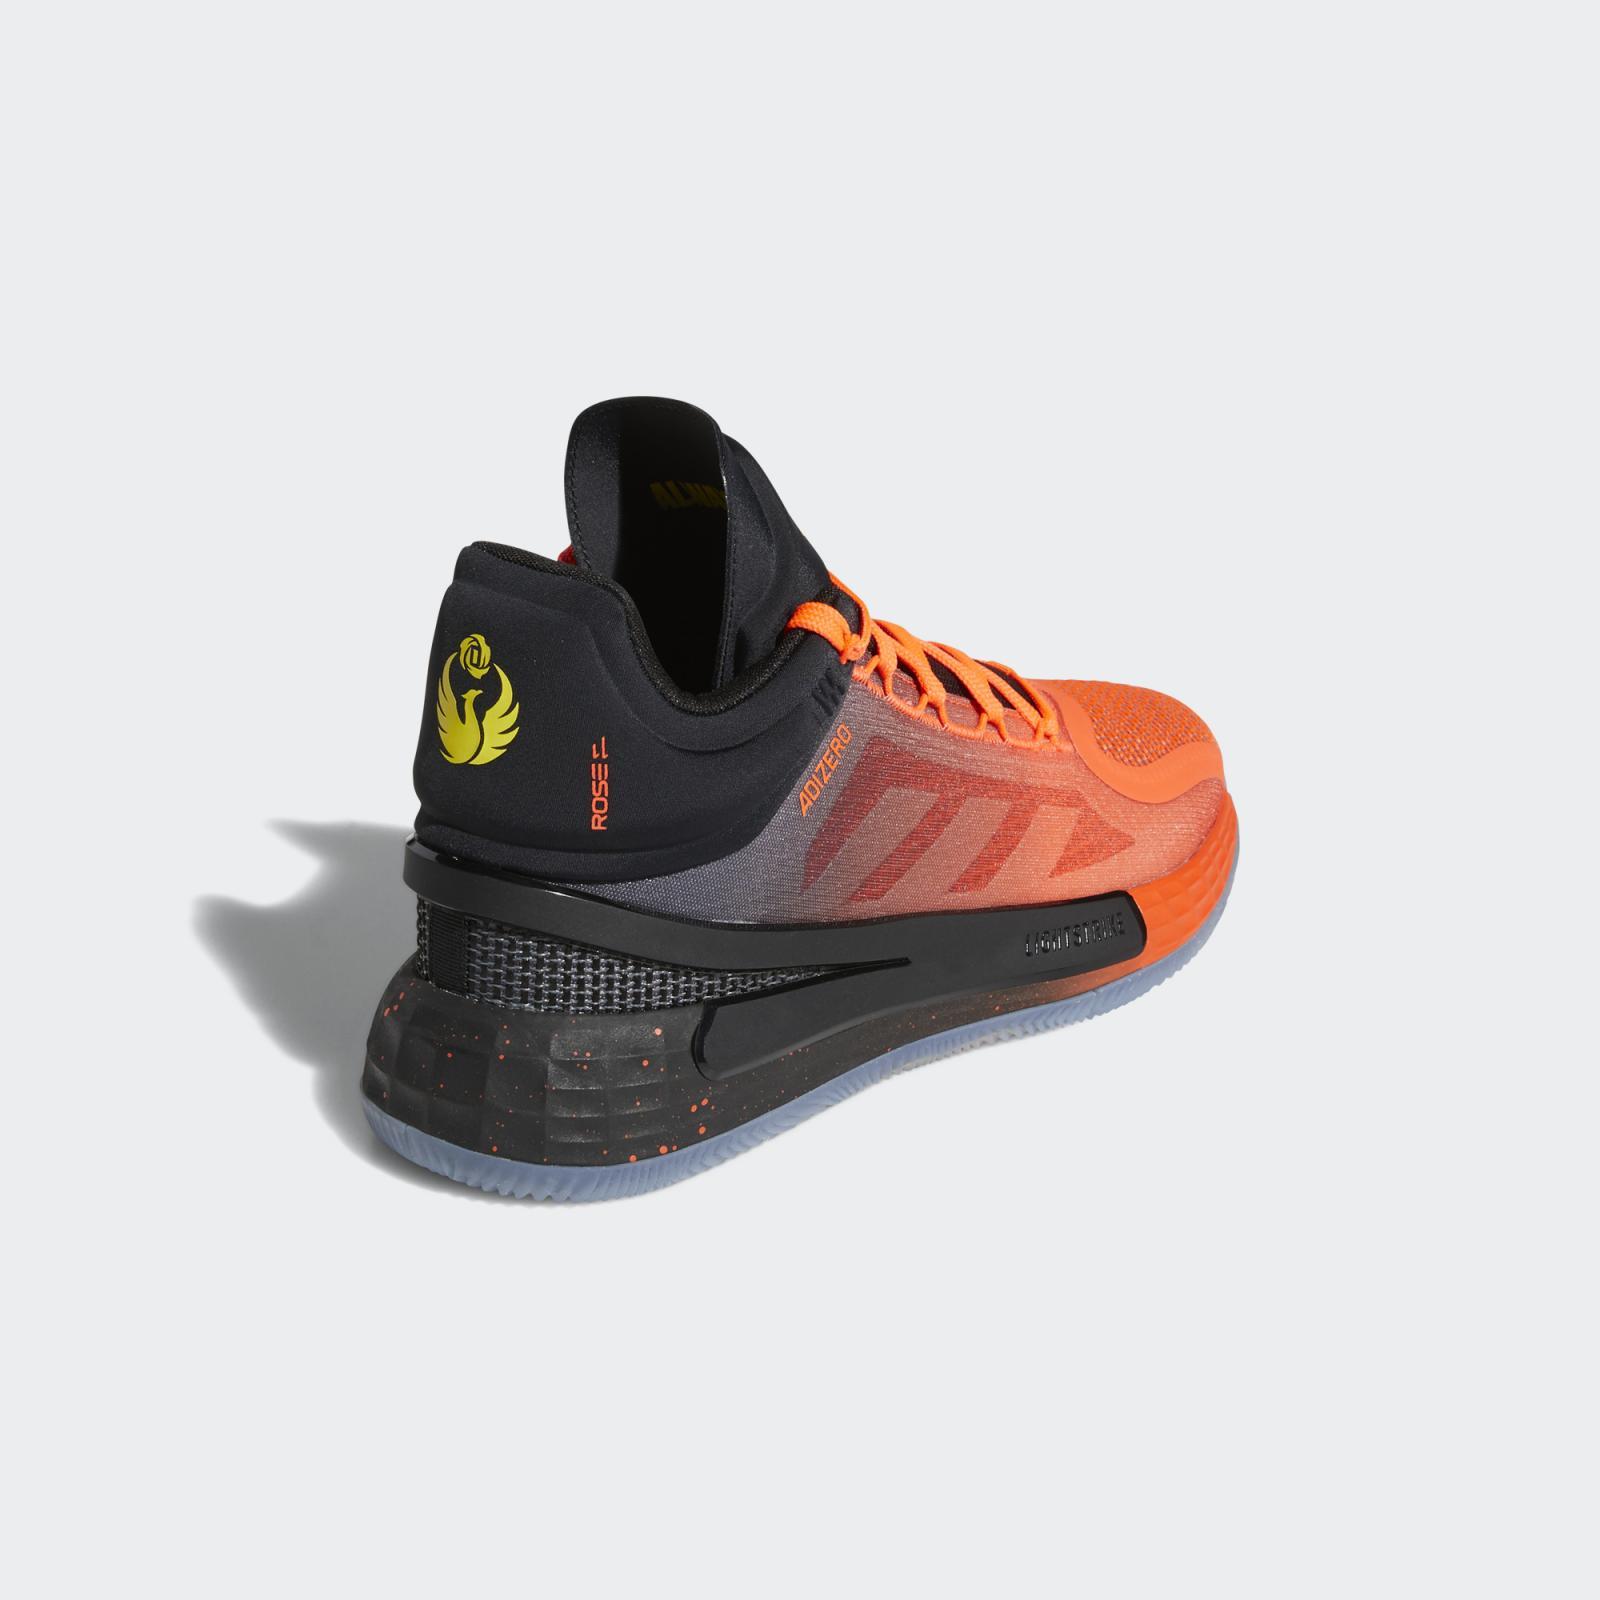 adidas Basketball发布全新一号黑/红荧光/黄色D Rose 11